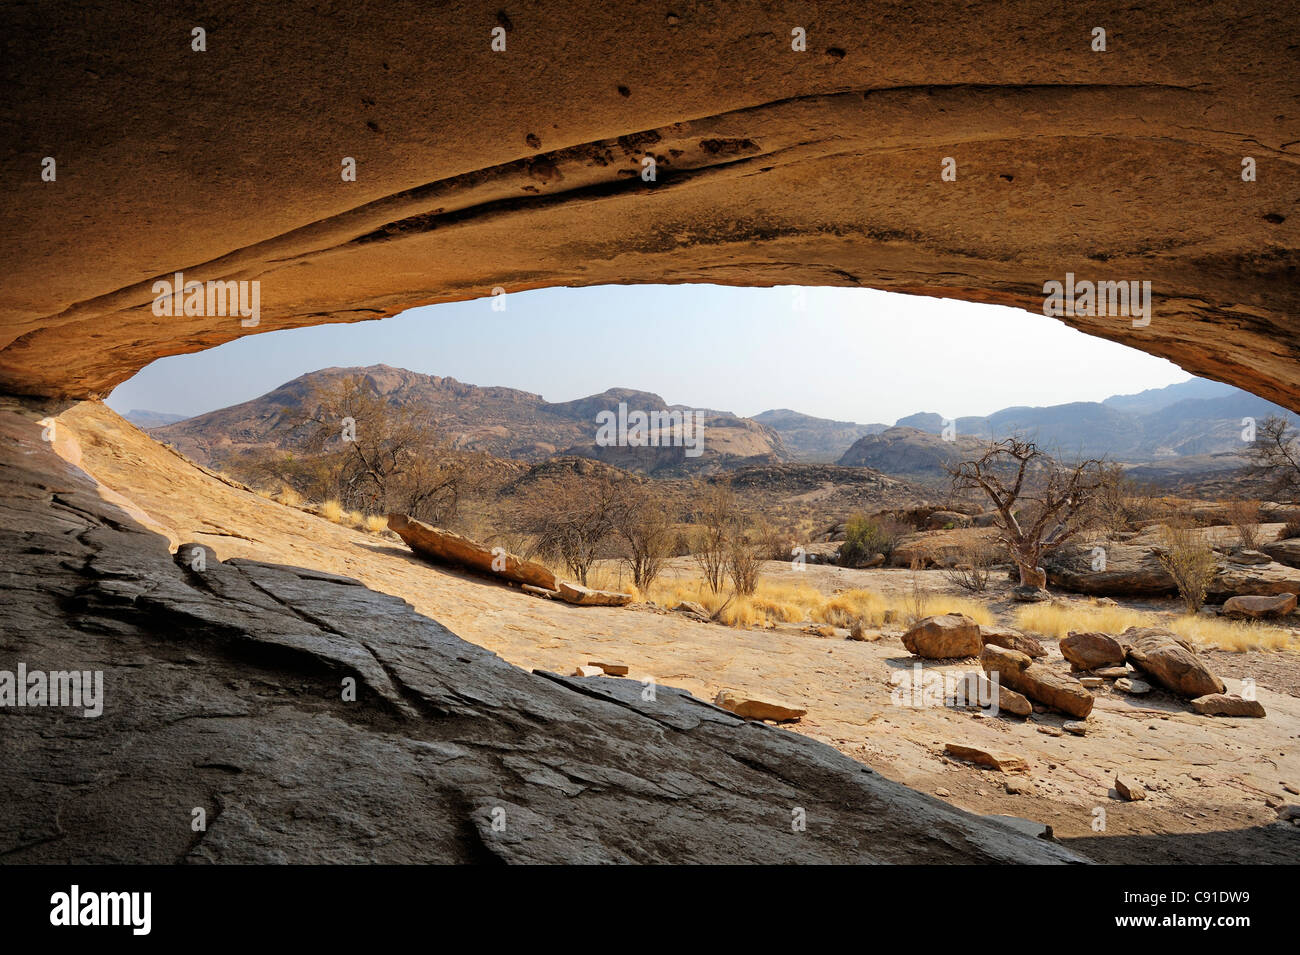 Abrigo rocoso Phillipp's Cave con vistas a Savannah, Ameib, montañas Erongo, Namibia Foto de stock